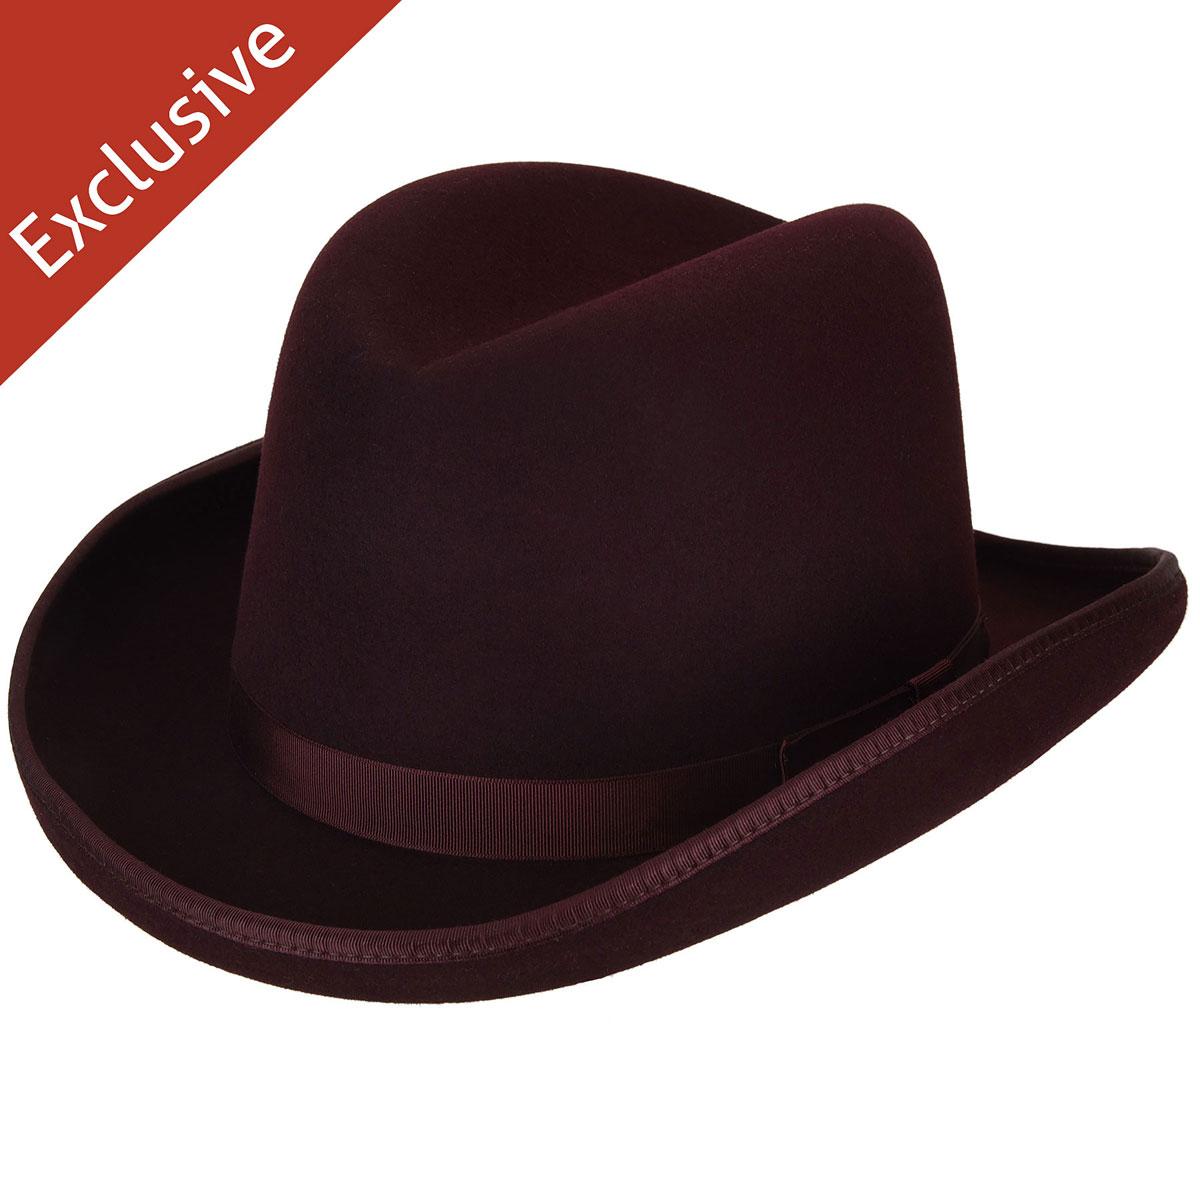 Hats.com Big Boss Homburg - Exclusive in Port